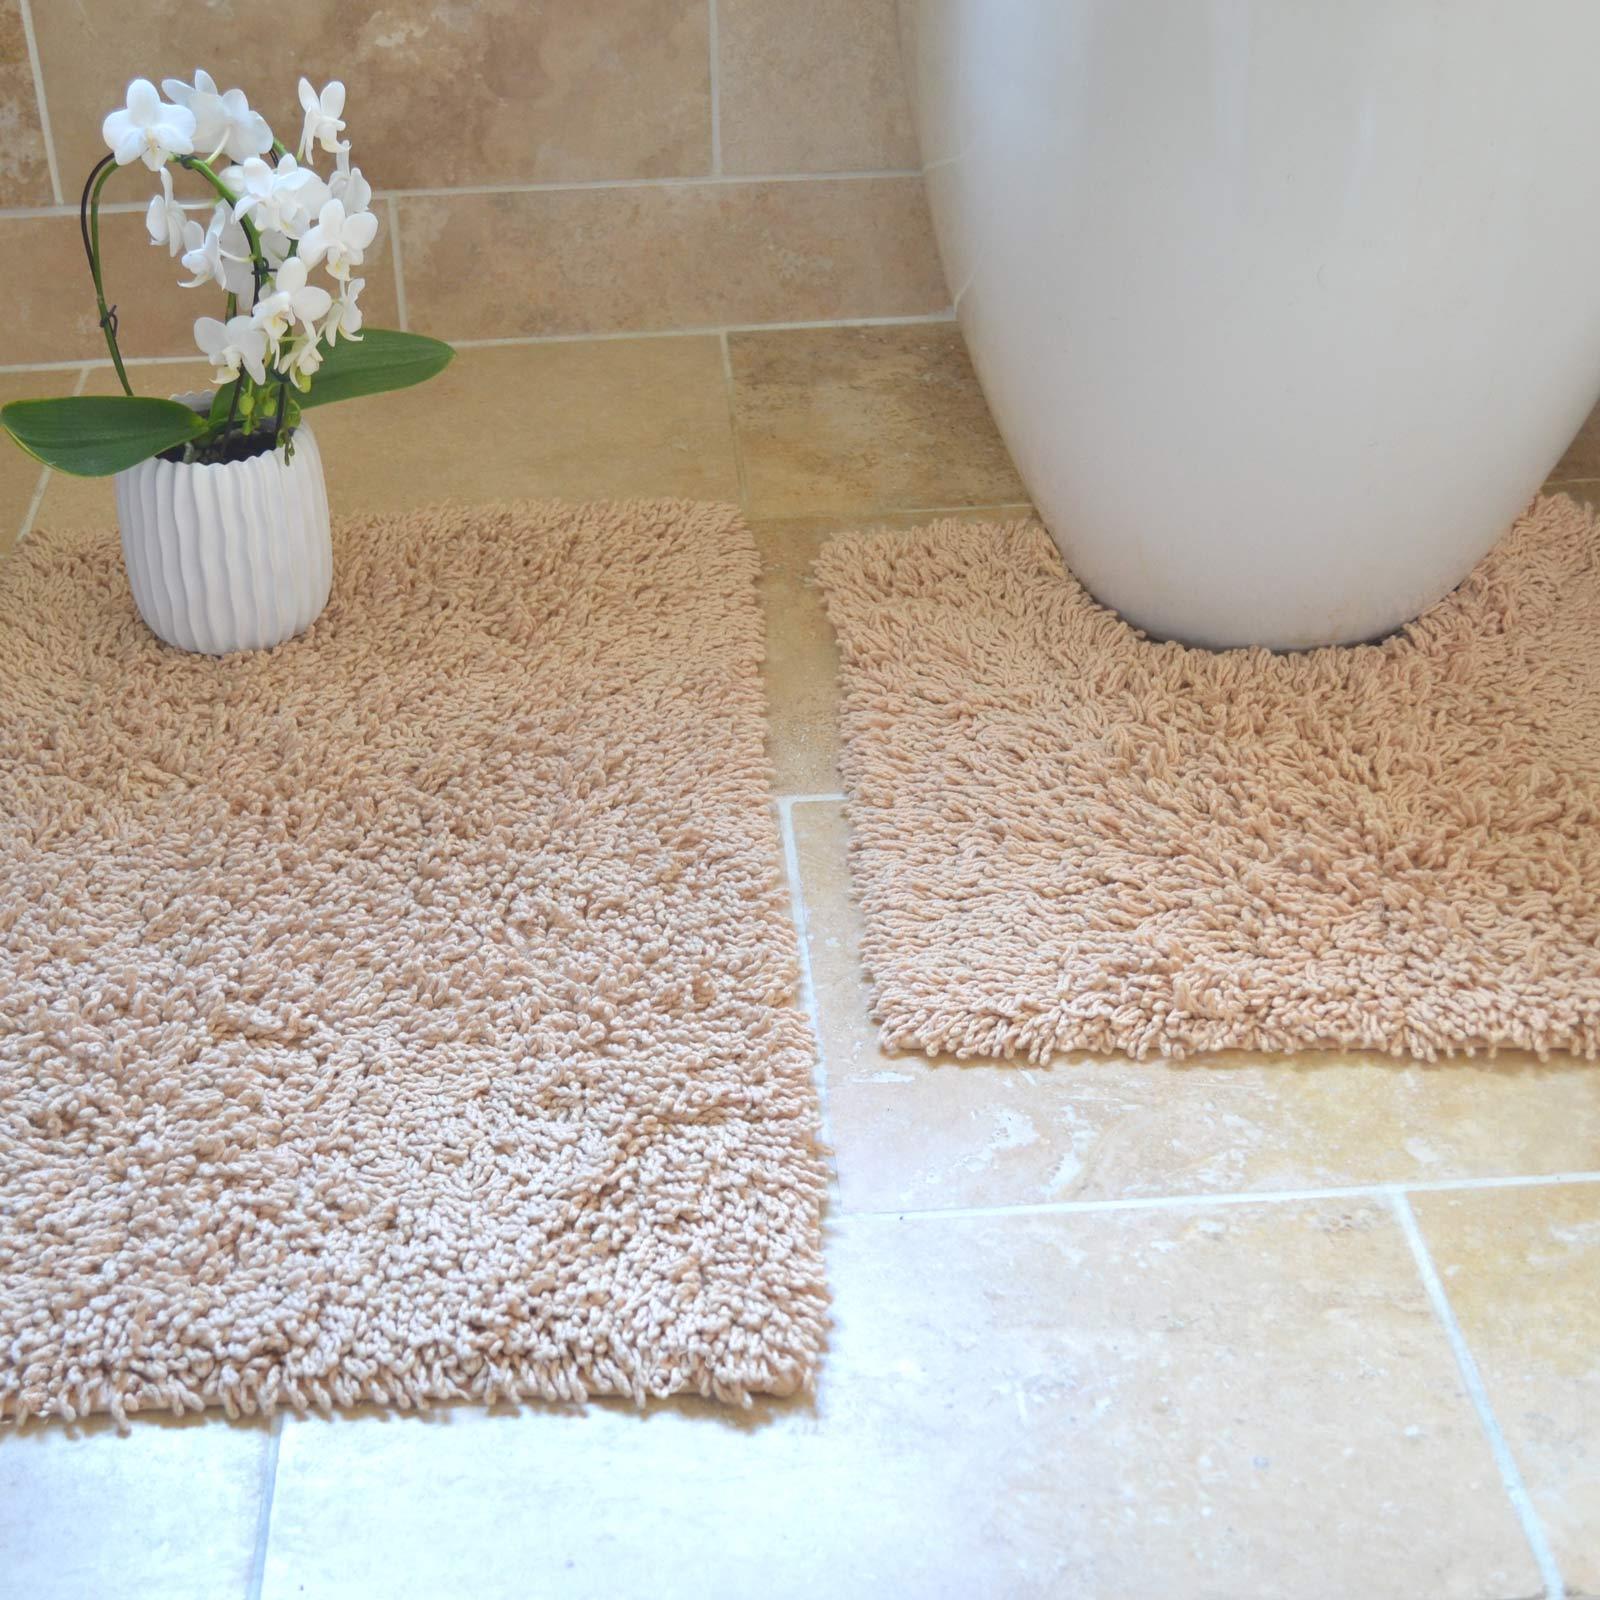 Large Tumble Twist Bath Mats